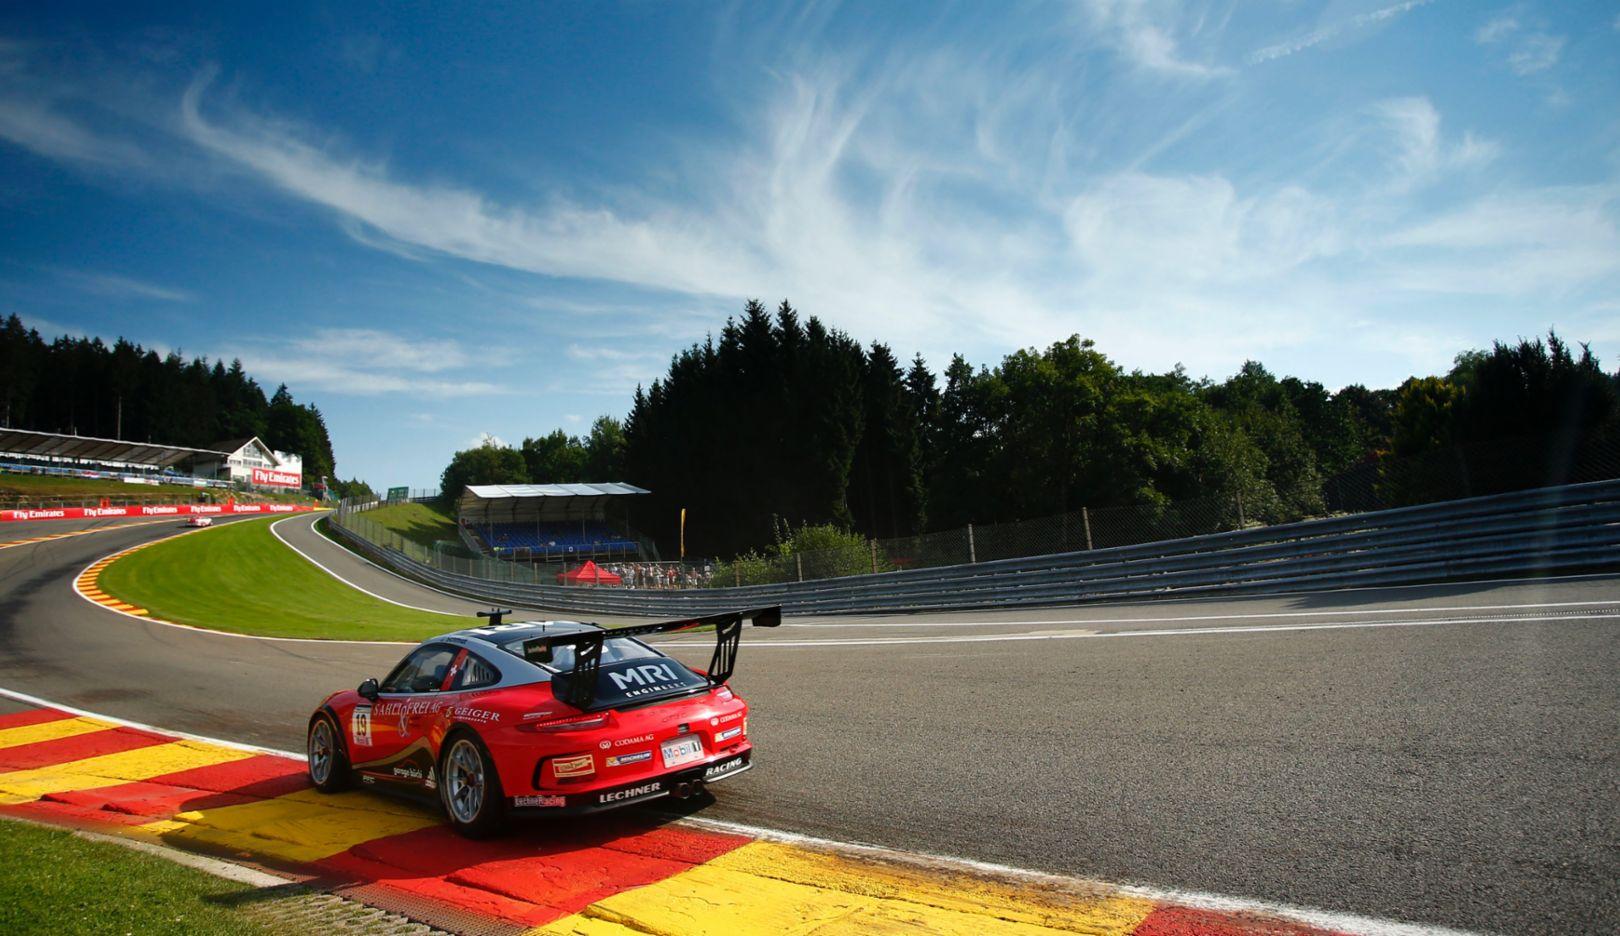 911 GT3 Cup, Porsche Mobil 1 Supercup, Formula One, 2016, Porsche AG